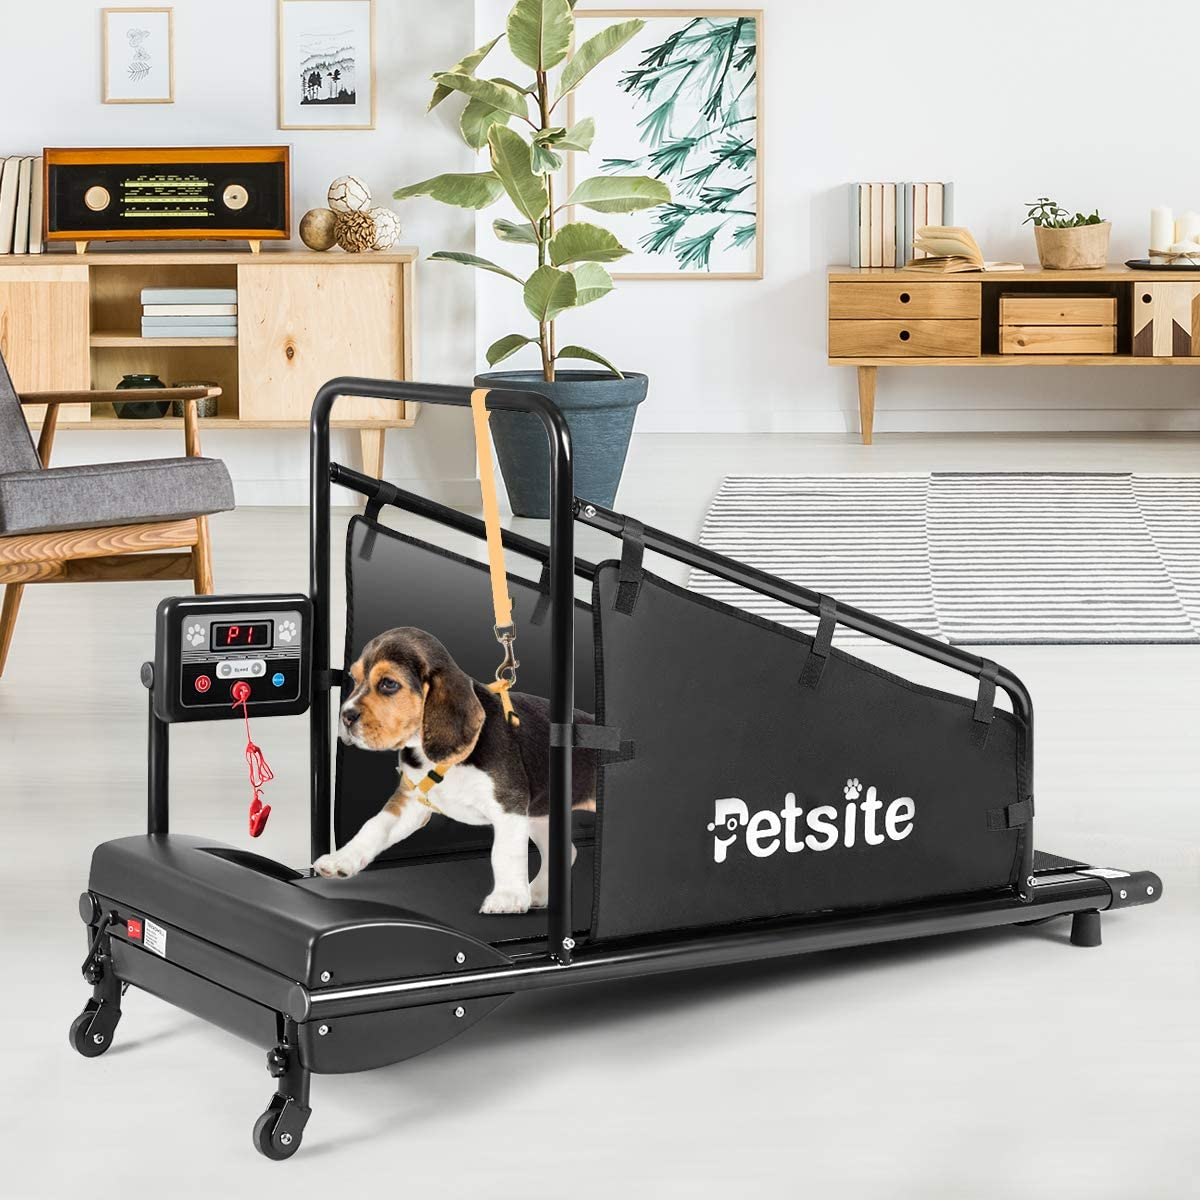 PETSITE Dog Treadmill, Pet Dog Running Machine for Small & Medium-Sized Dogs, Pet Fitness Treadmill with 1.4'' LCD Display Screen, 200 LBS Capacity